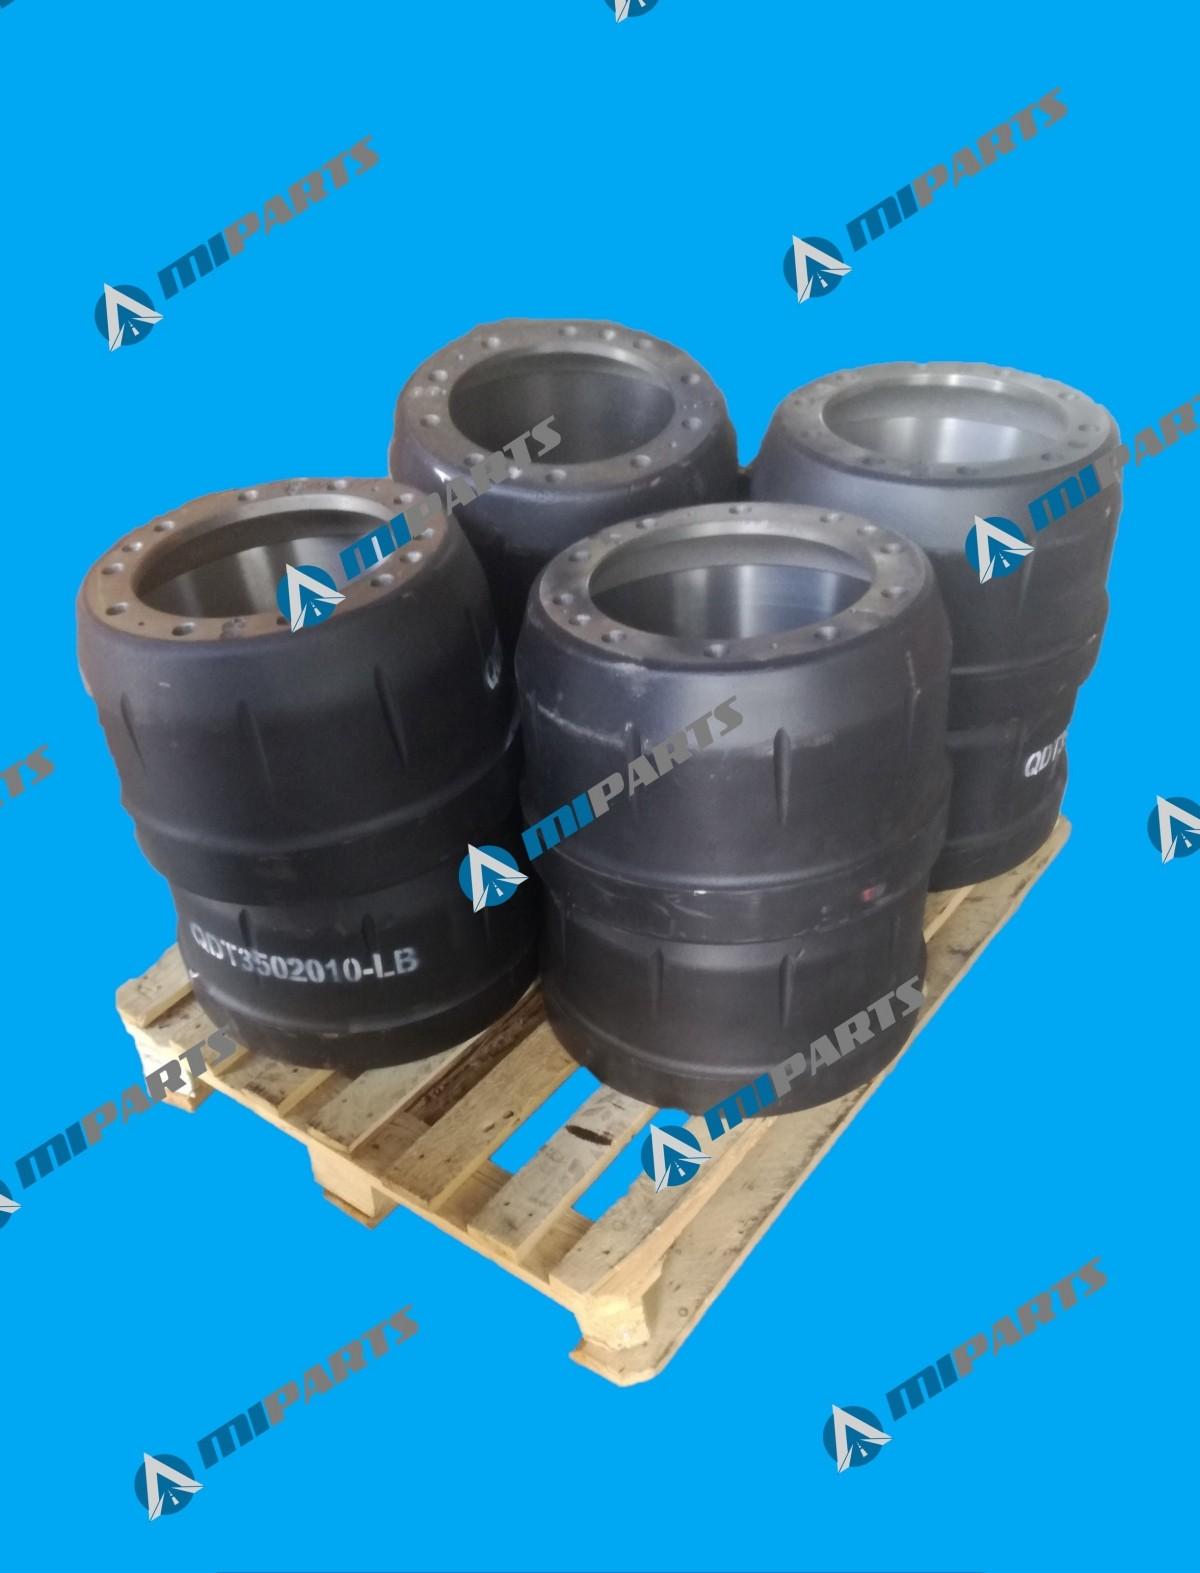 QDT3502010-LB Тормозной барабан 6520 фото запчасти